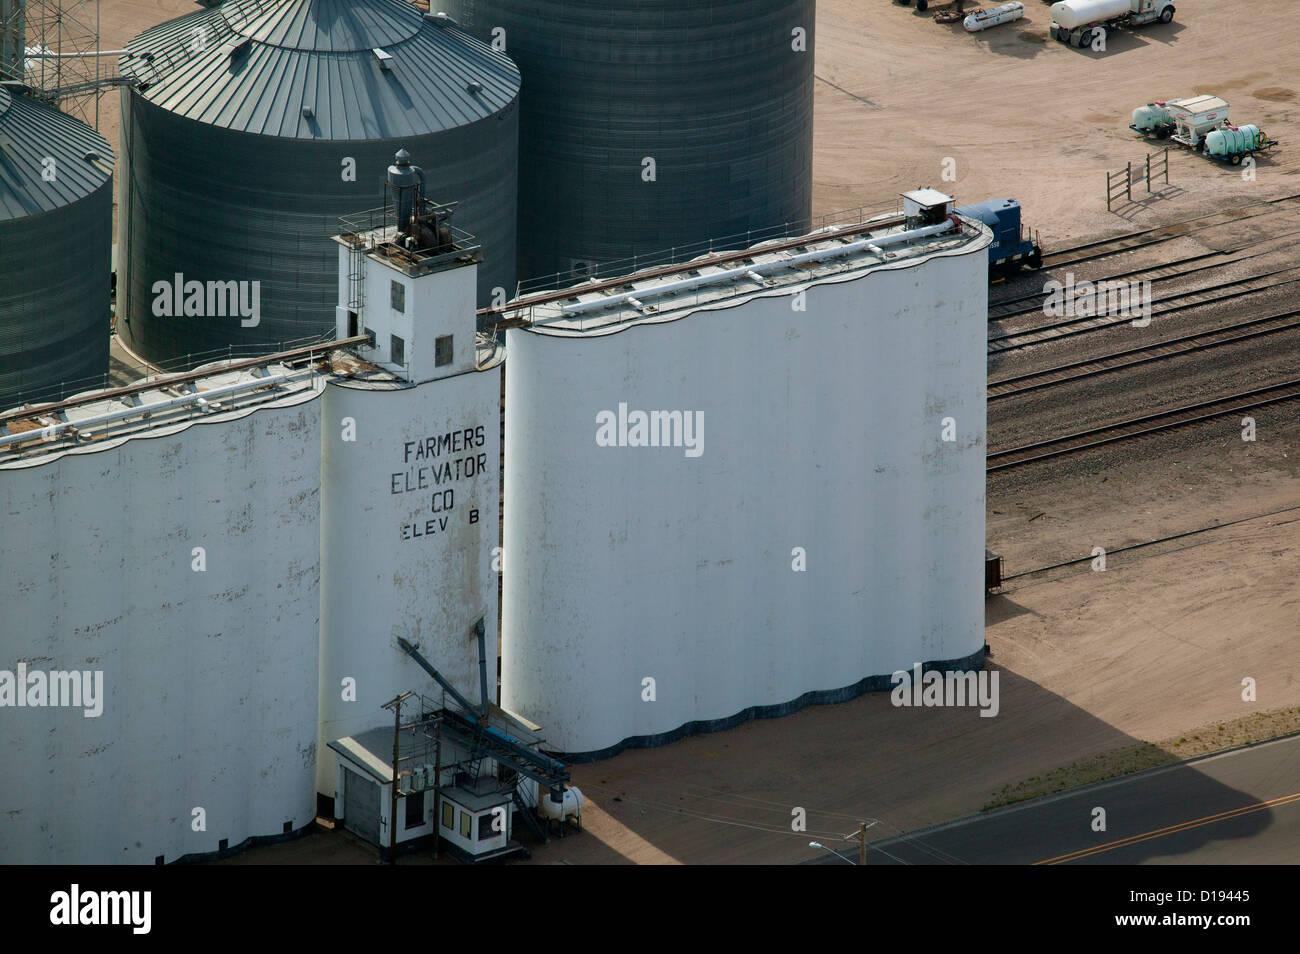 aerial photograph grain elevators Farmers Elevator Company Chappell Nebraska - Stock Image